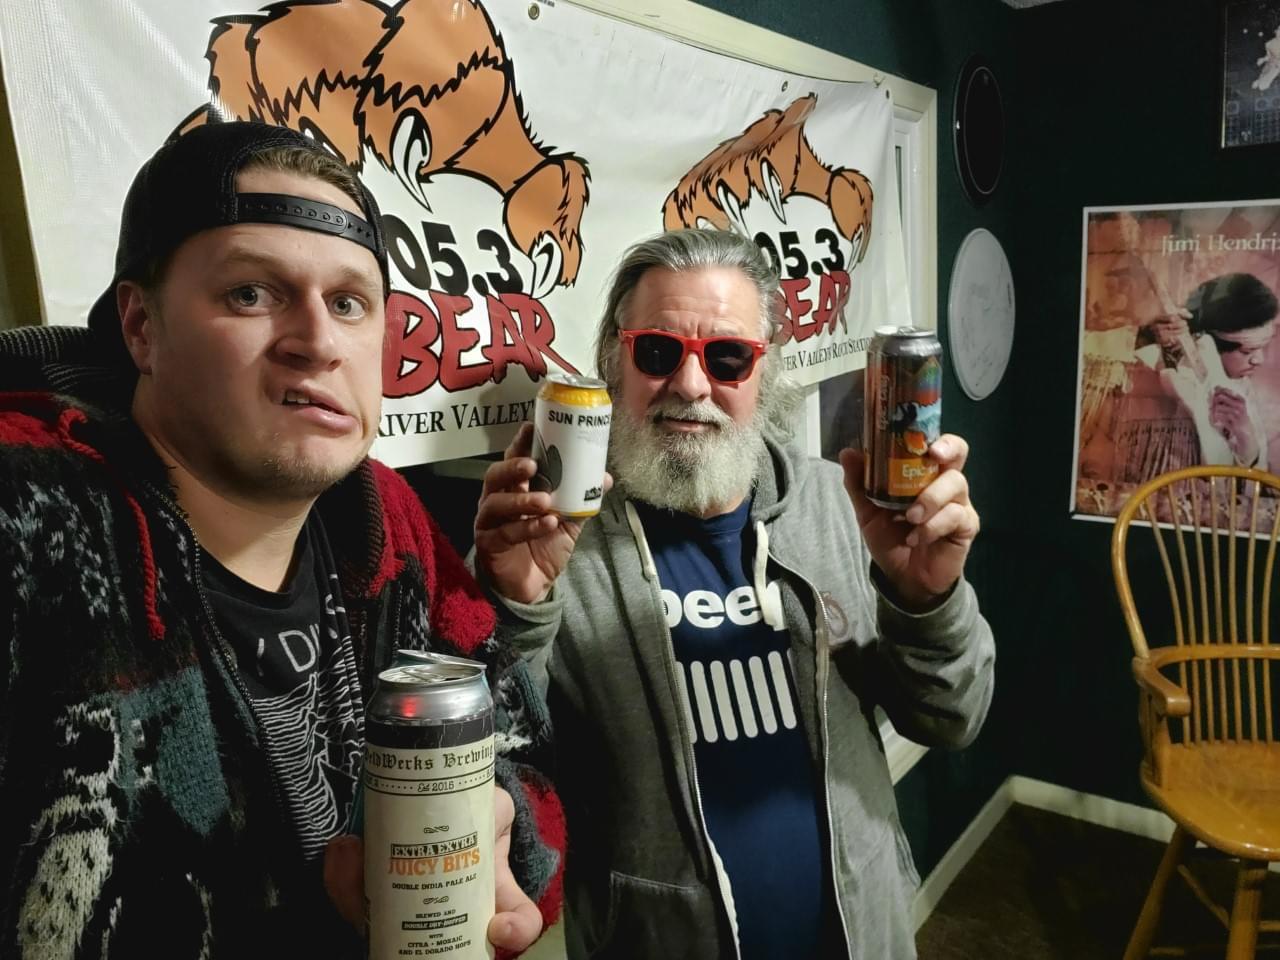 01/12/2021 Brewsday Tuesday: Colorado Beers 2